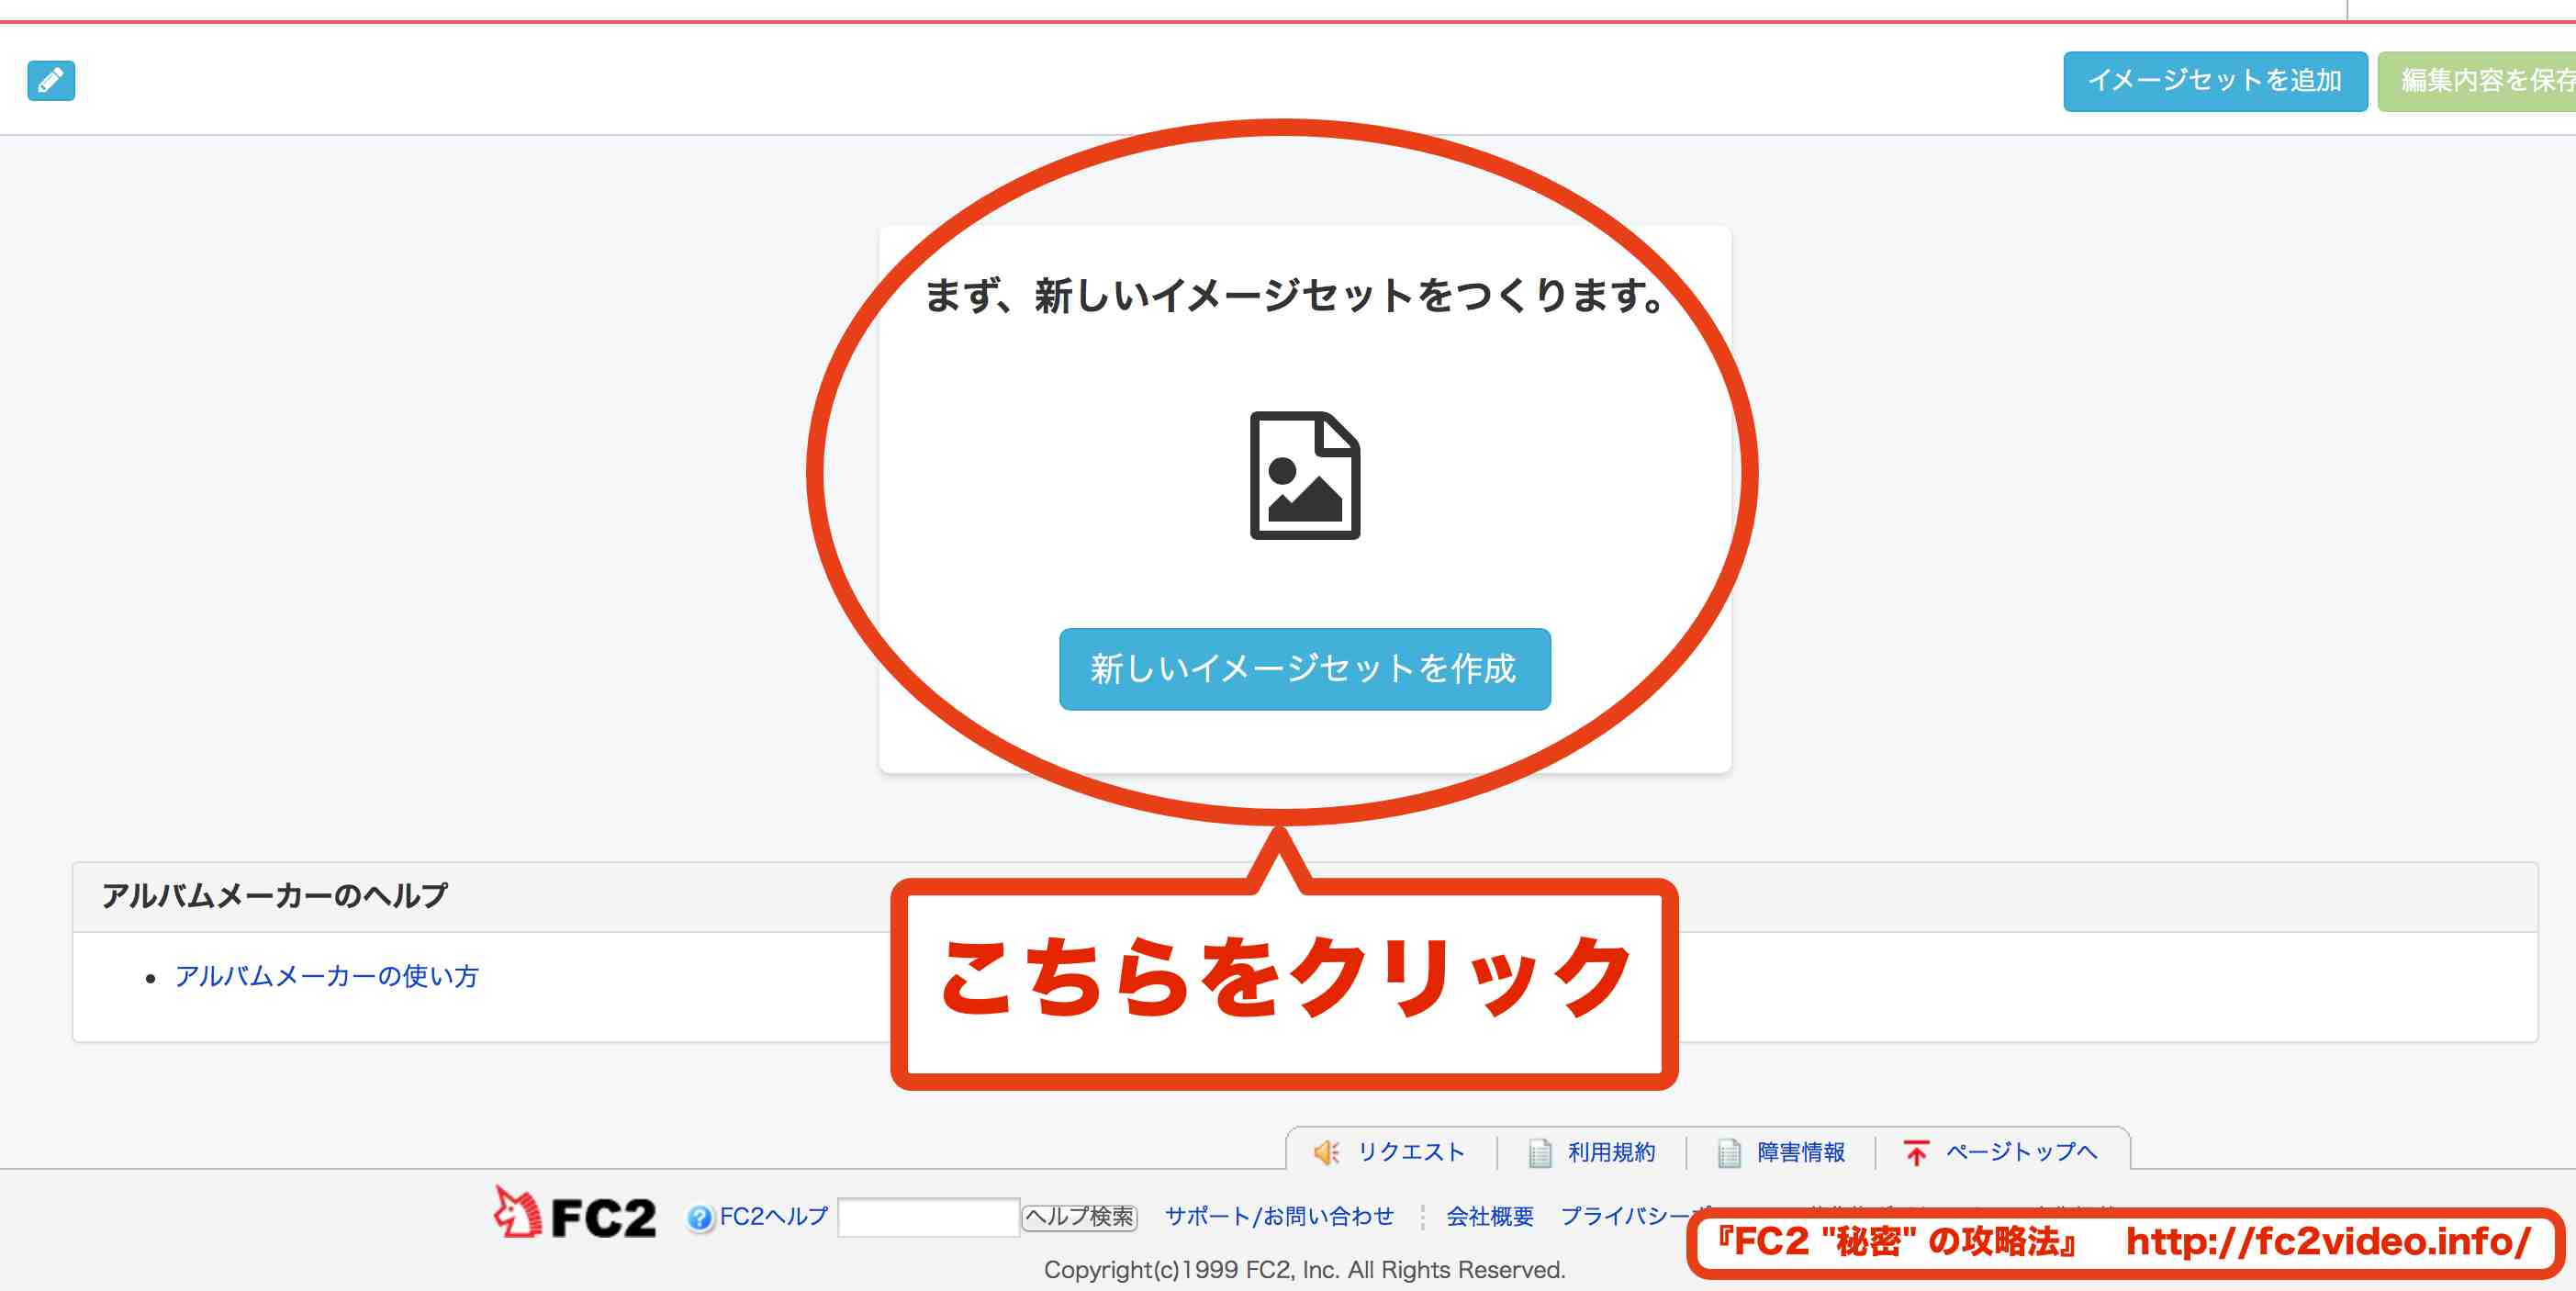 FC2ホームページにWEB漫画を載せる方法7